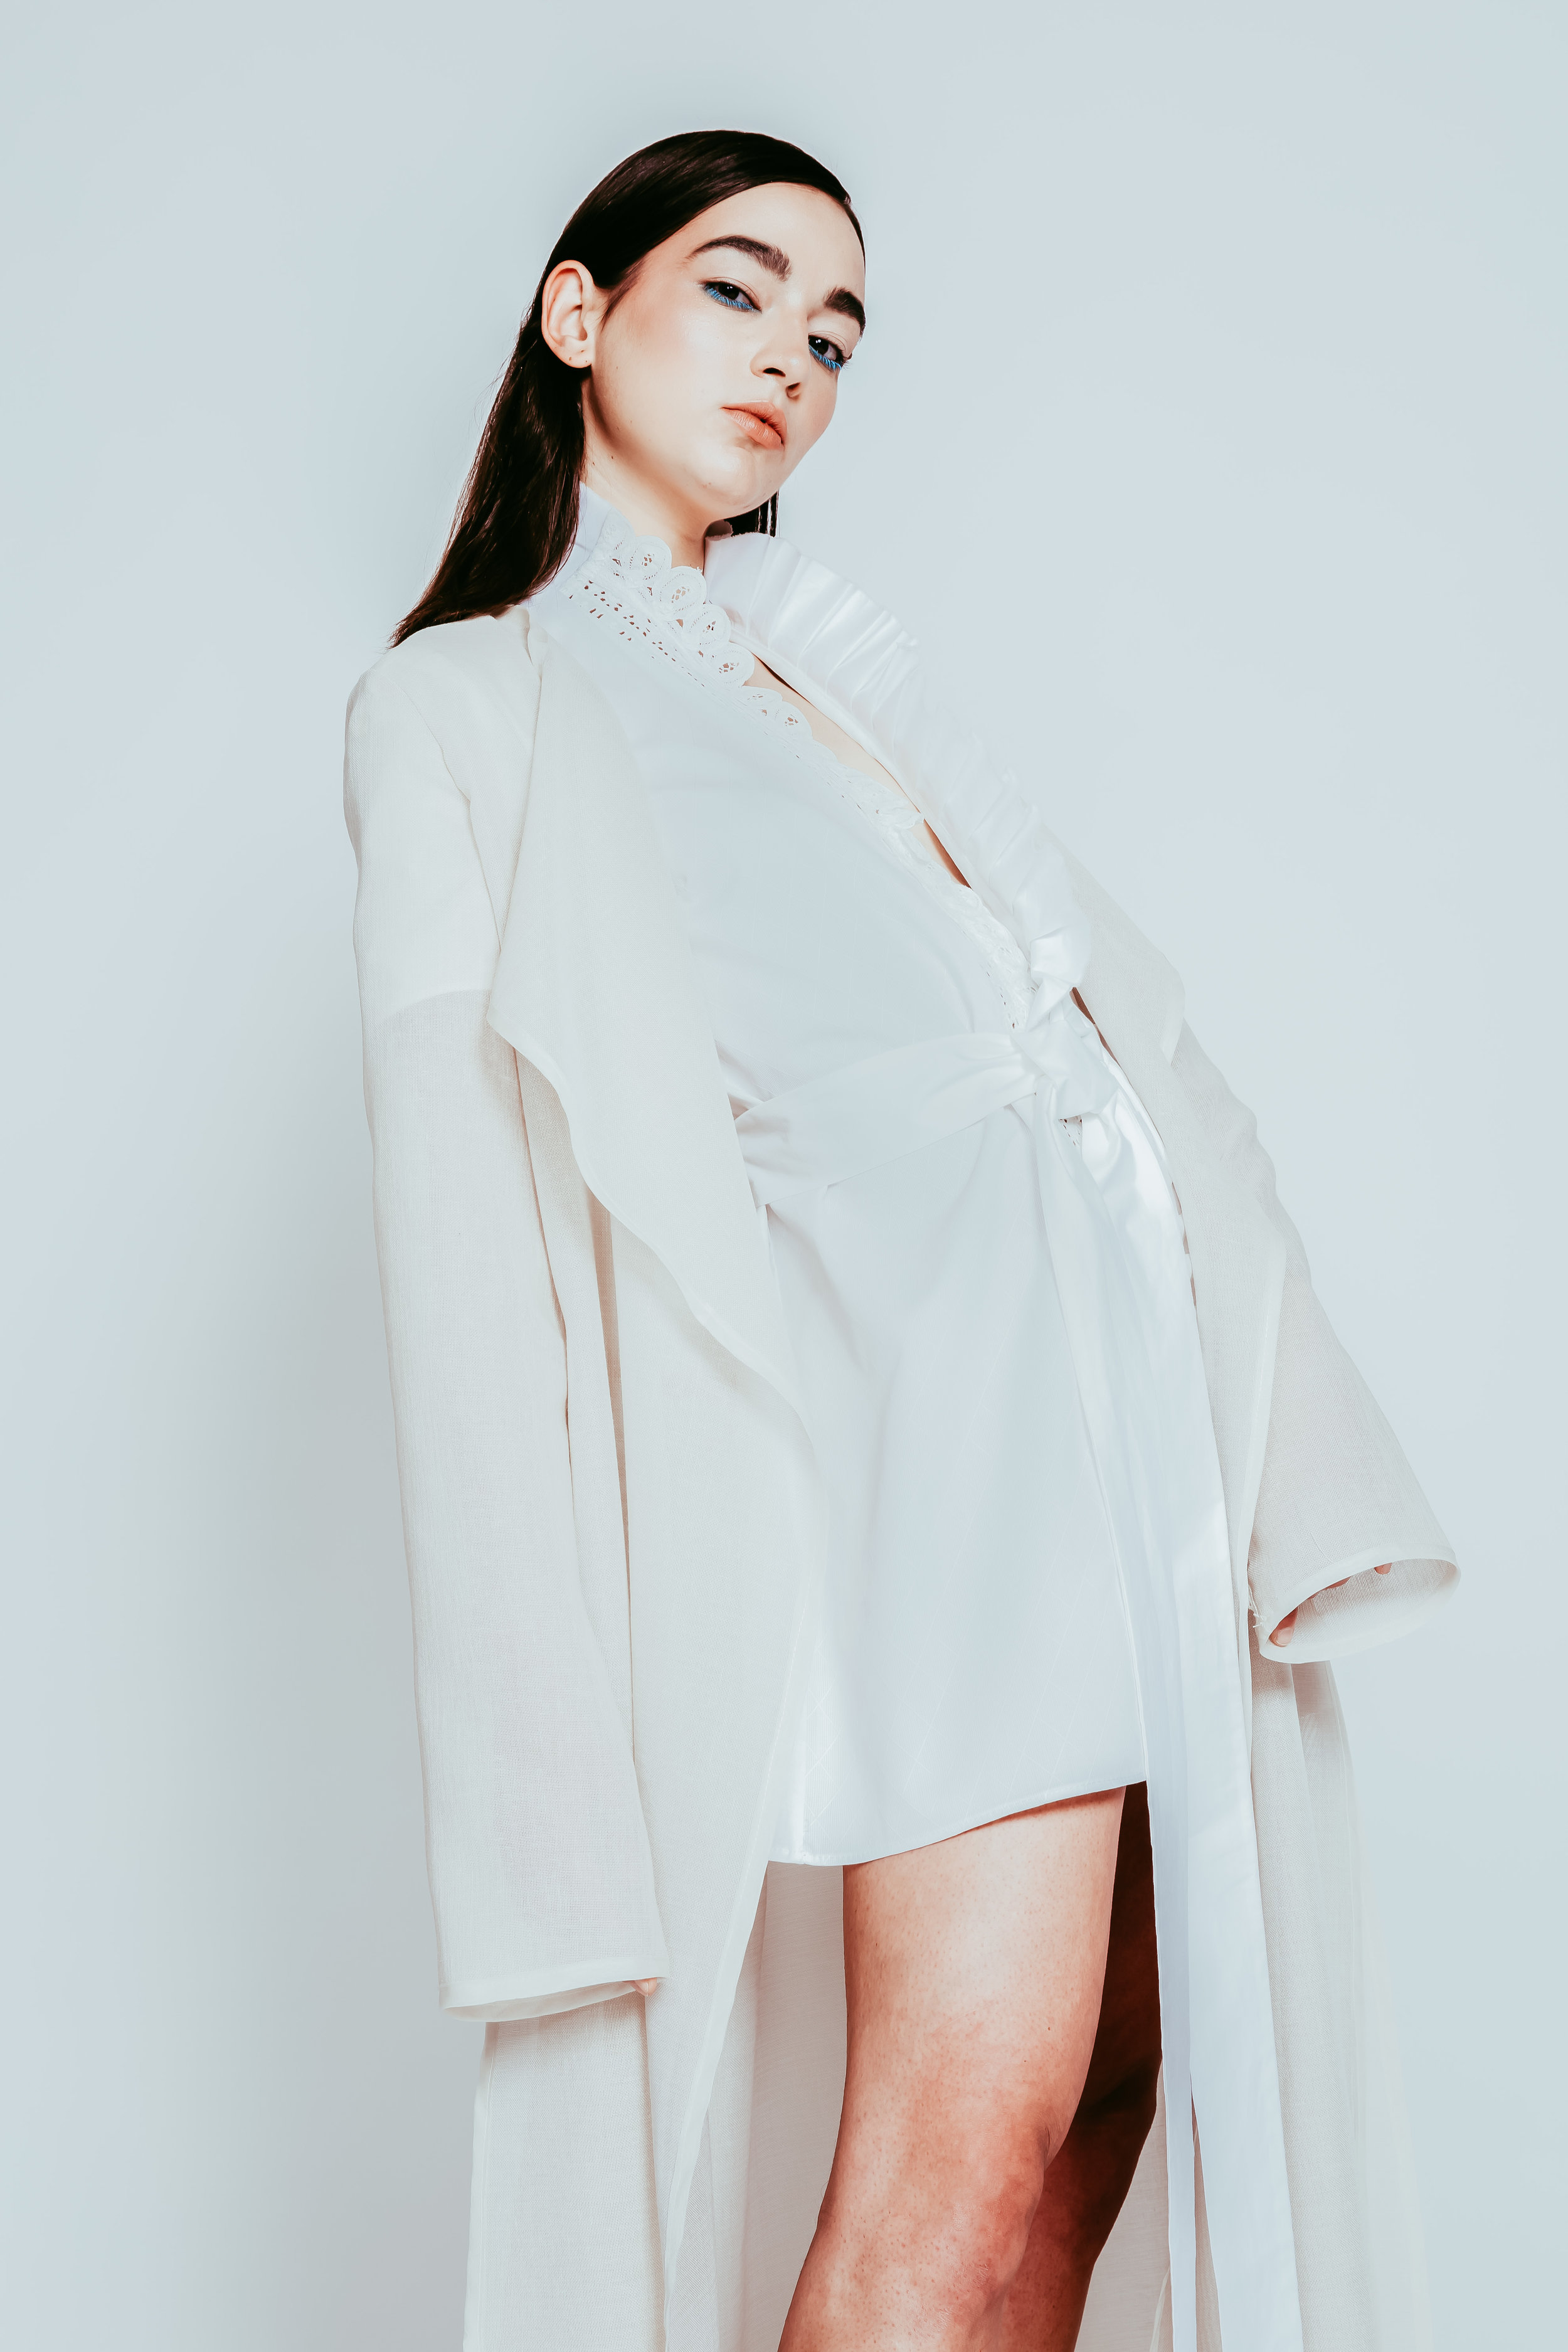 Linda Marik | The House of Zed | Bintang Models